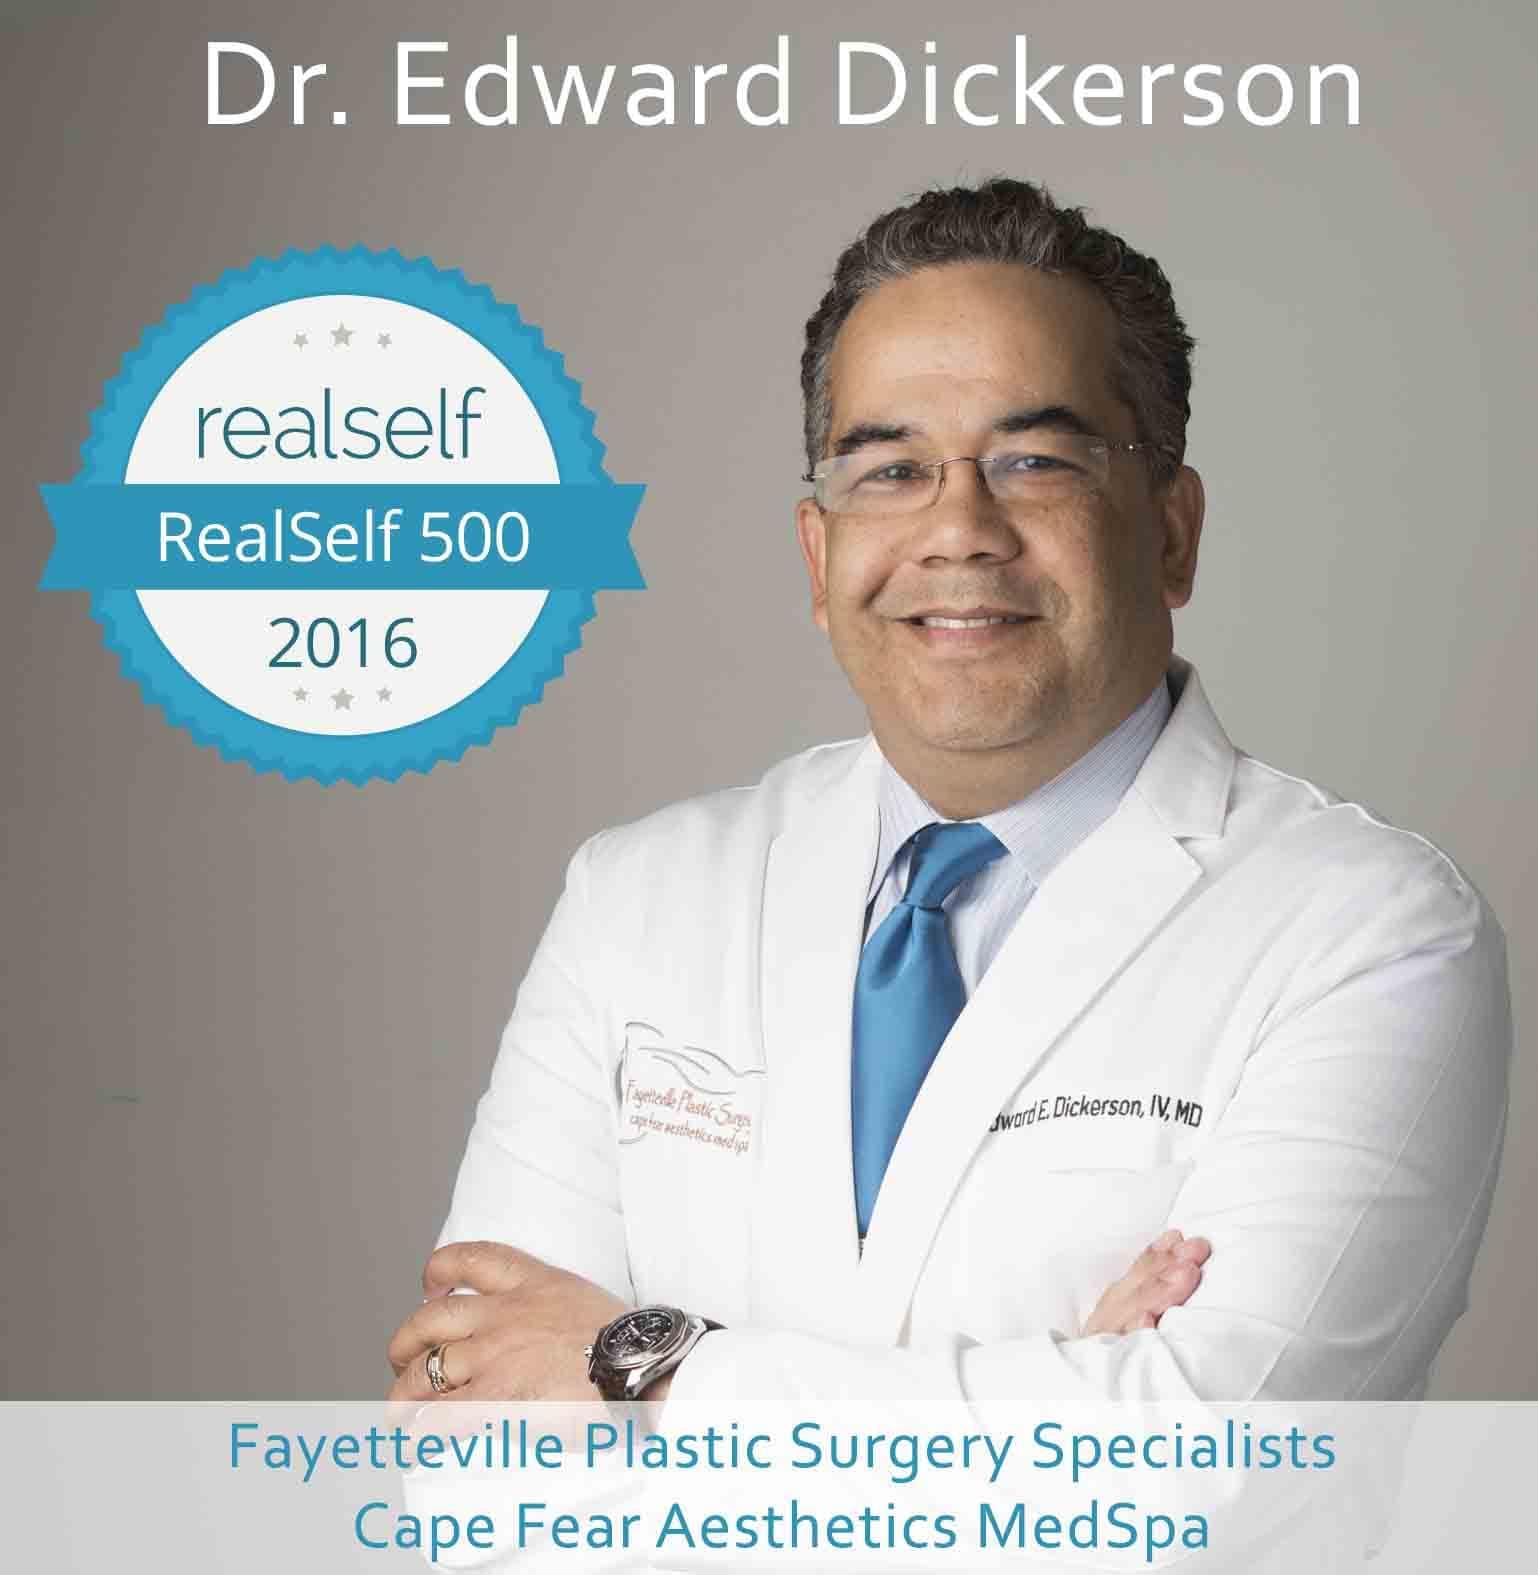 Dr. Edward Dickerson Receives RealSelf 500 Award – Cape Fear Aesthetics MedSpa, North Carolina